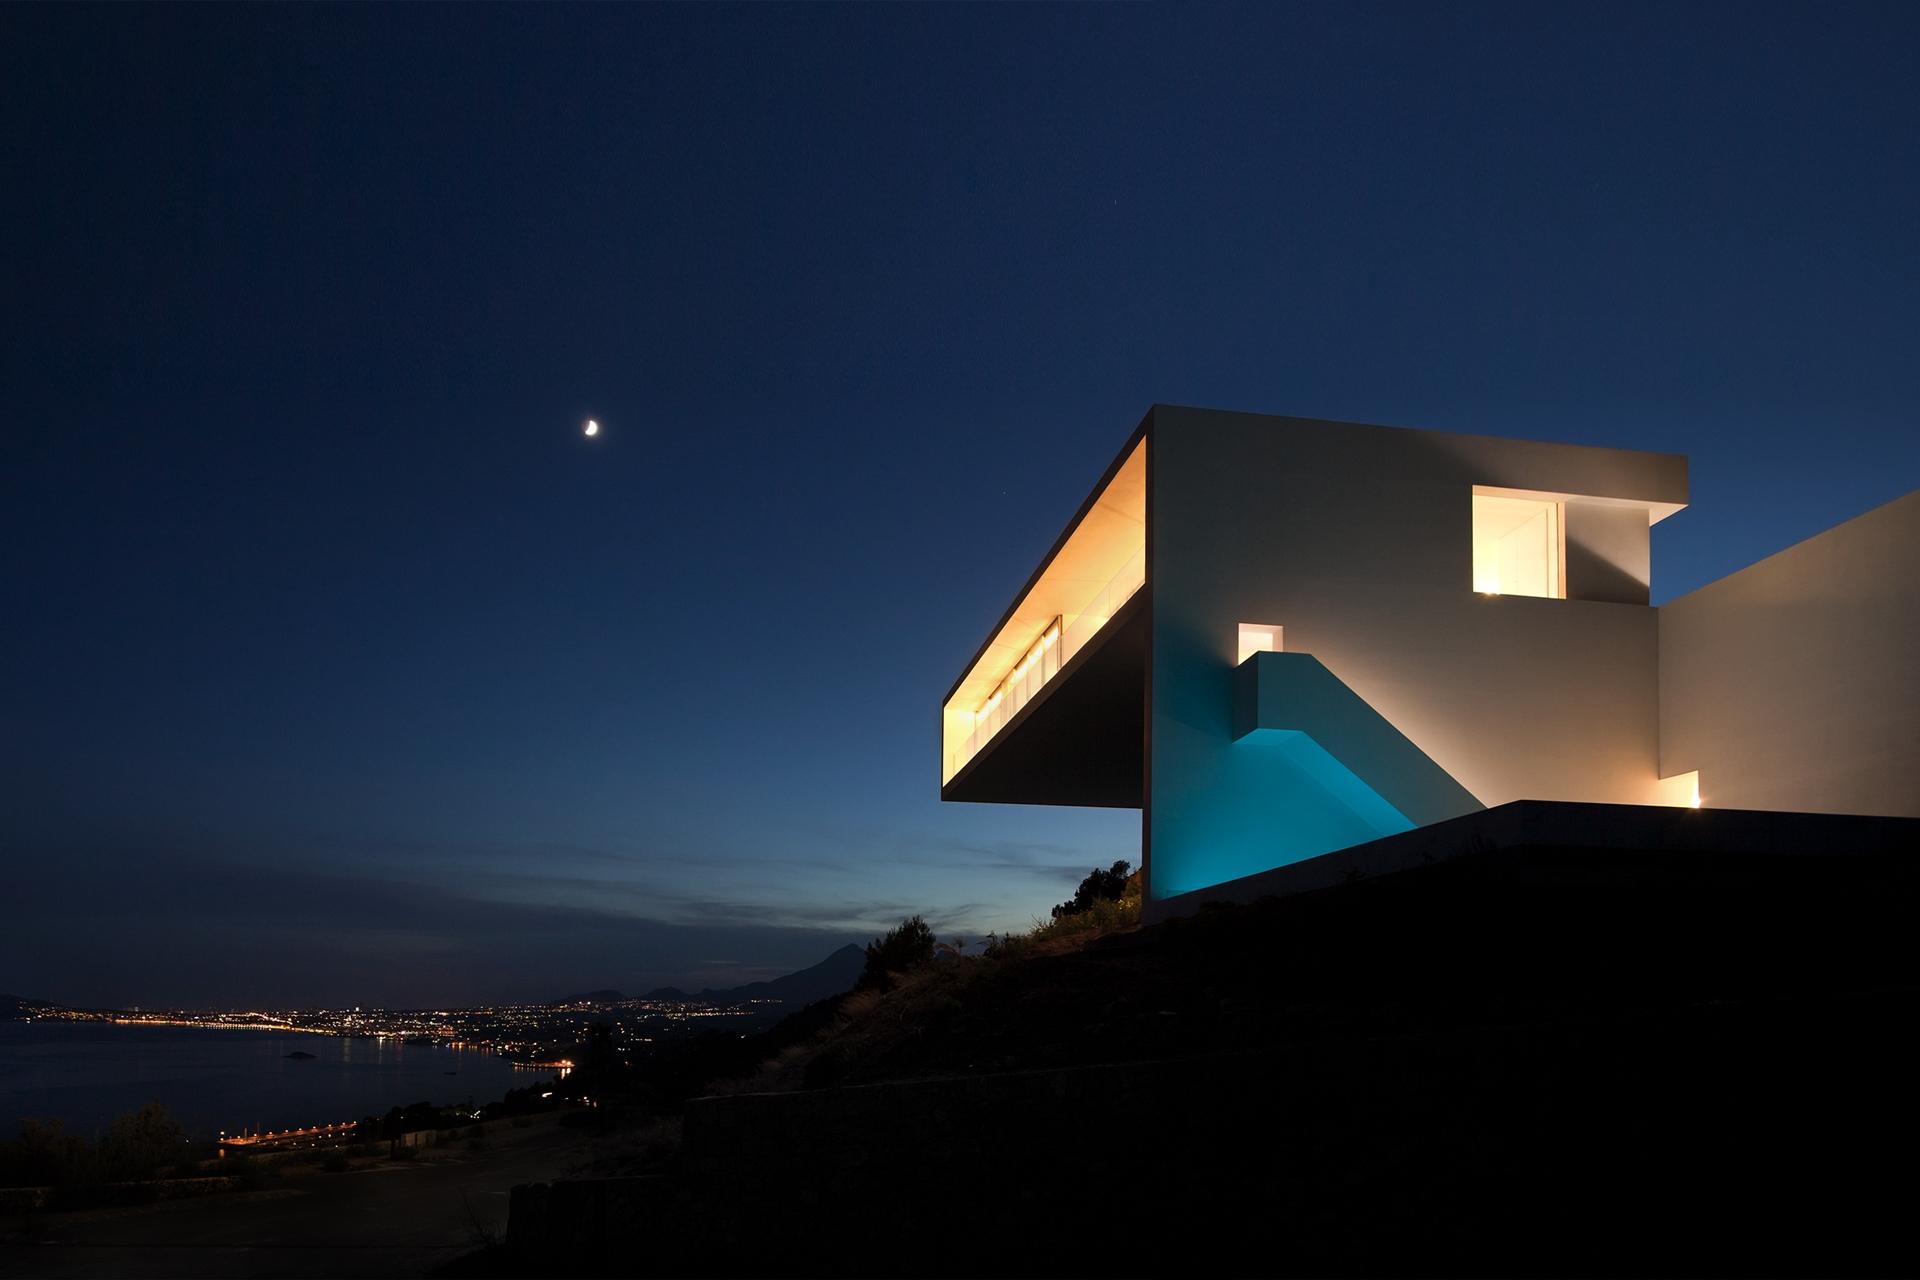 Minimalist house design breathtaking home on the cliffs for Minimalist house design 36 72